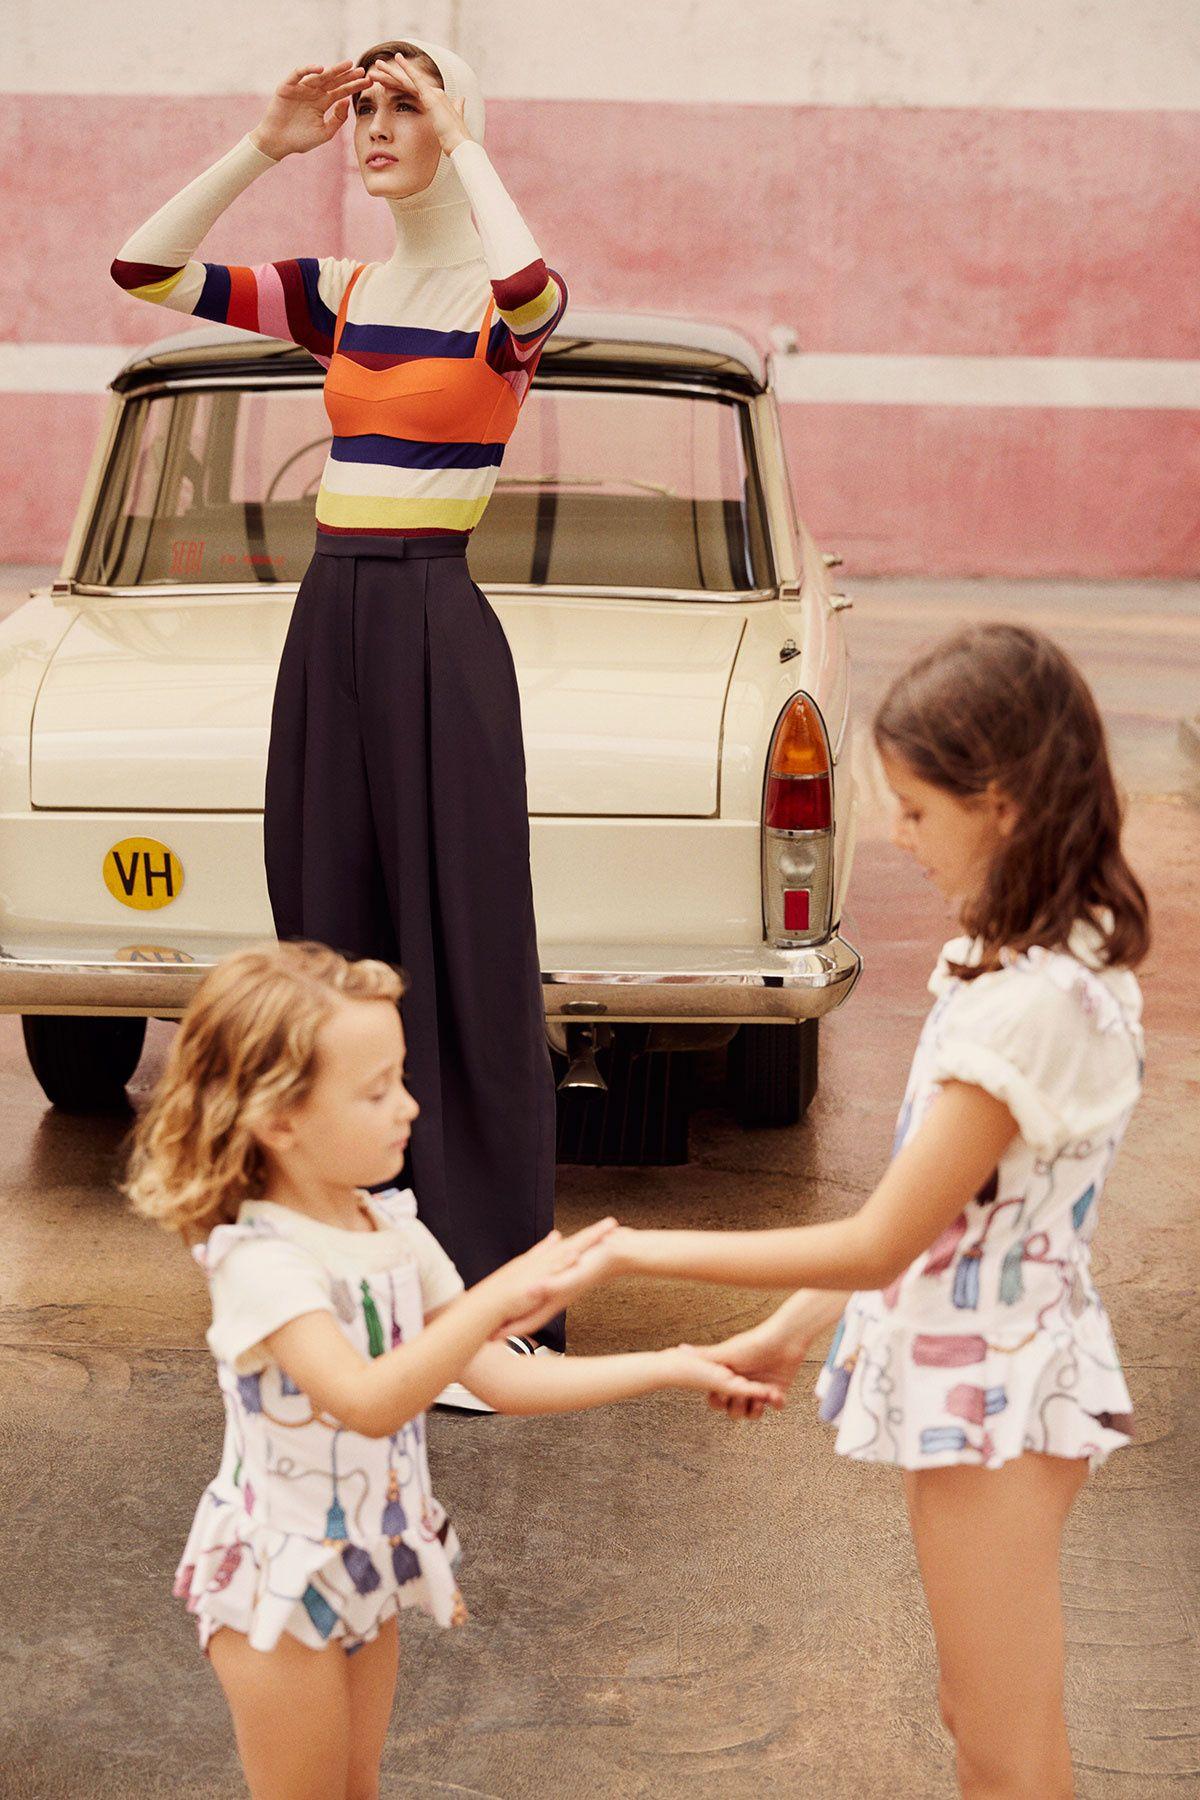 b31d08ee29f6 Bañadores a juego (con tu hermana) | estilos | Pinterest